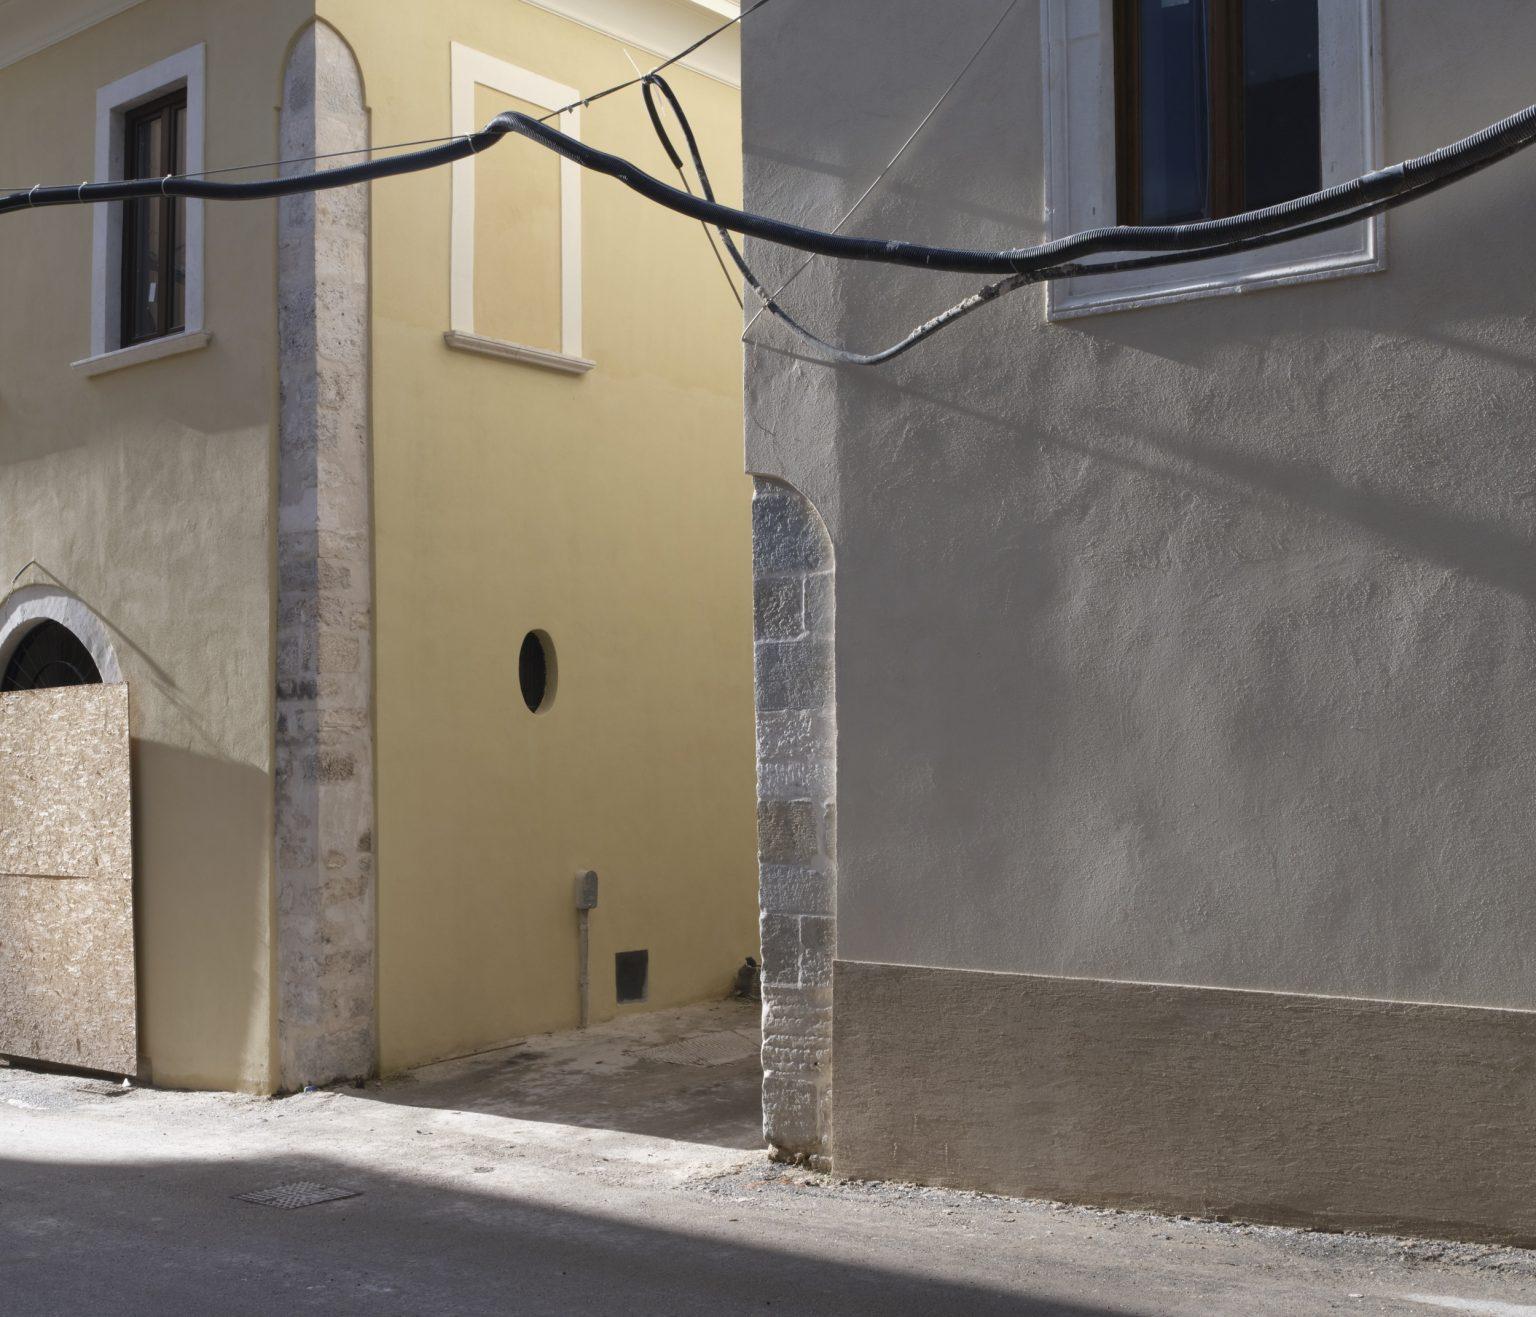 Via dell'Arcivescovado, renovation of private residential buildings. L'Aquila, historic center, Italy, 2019